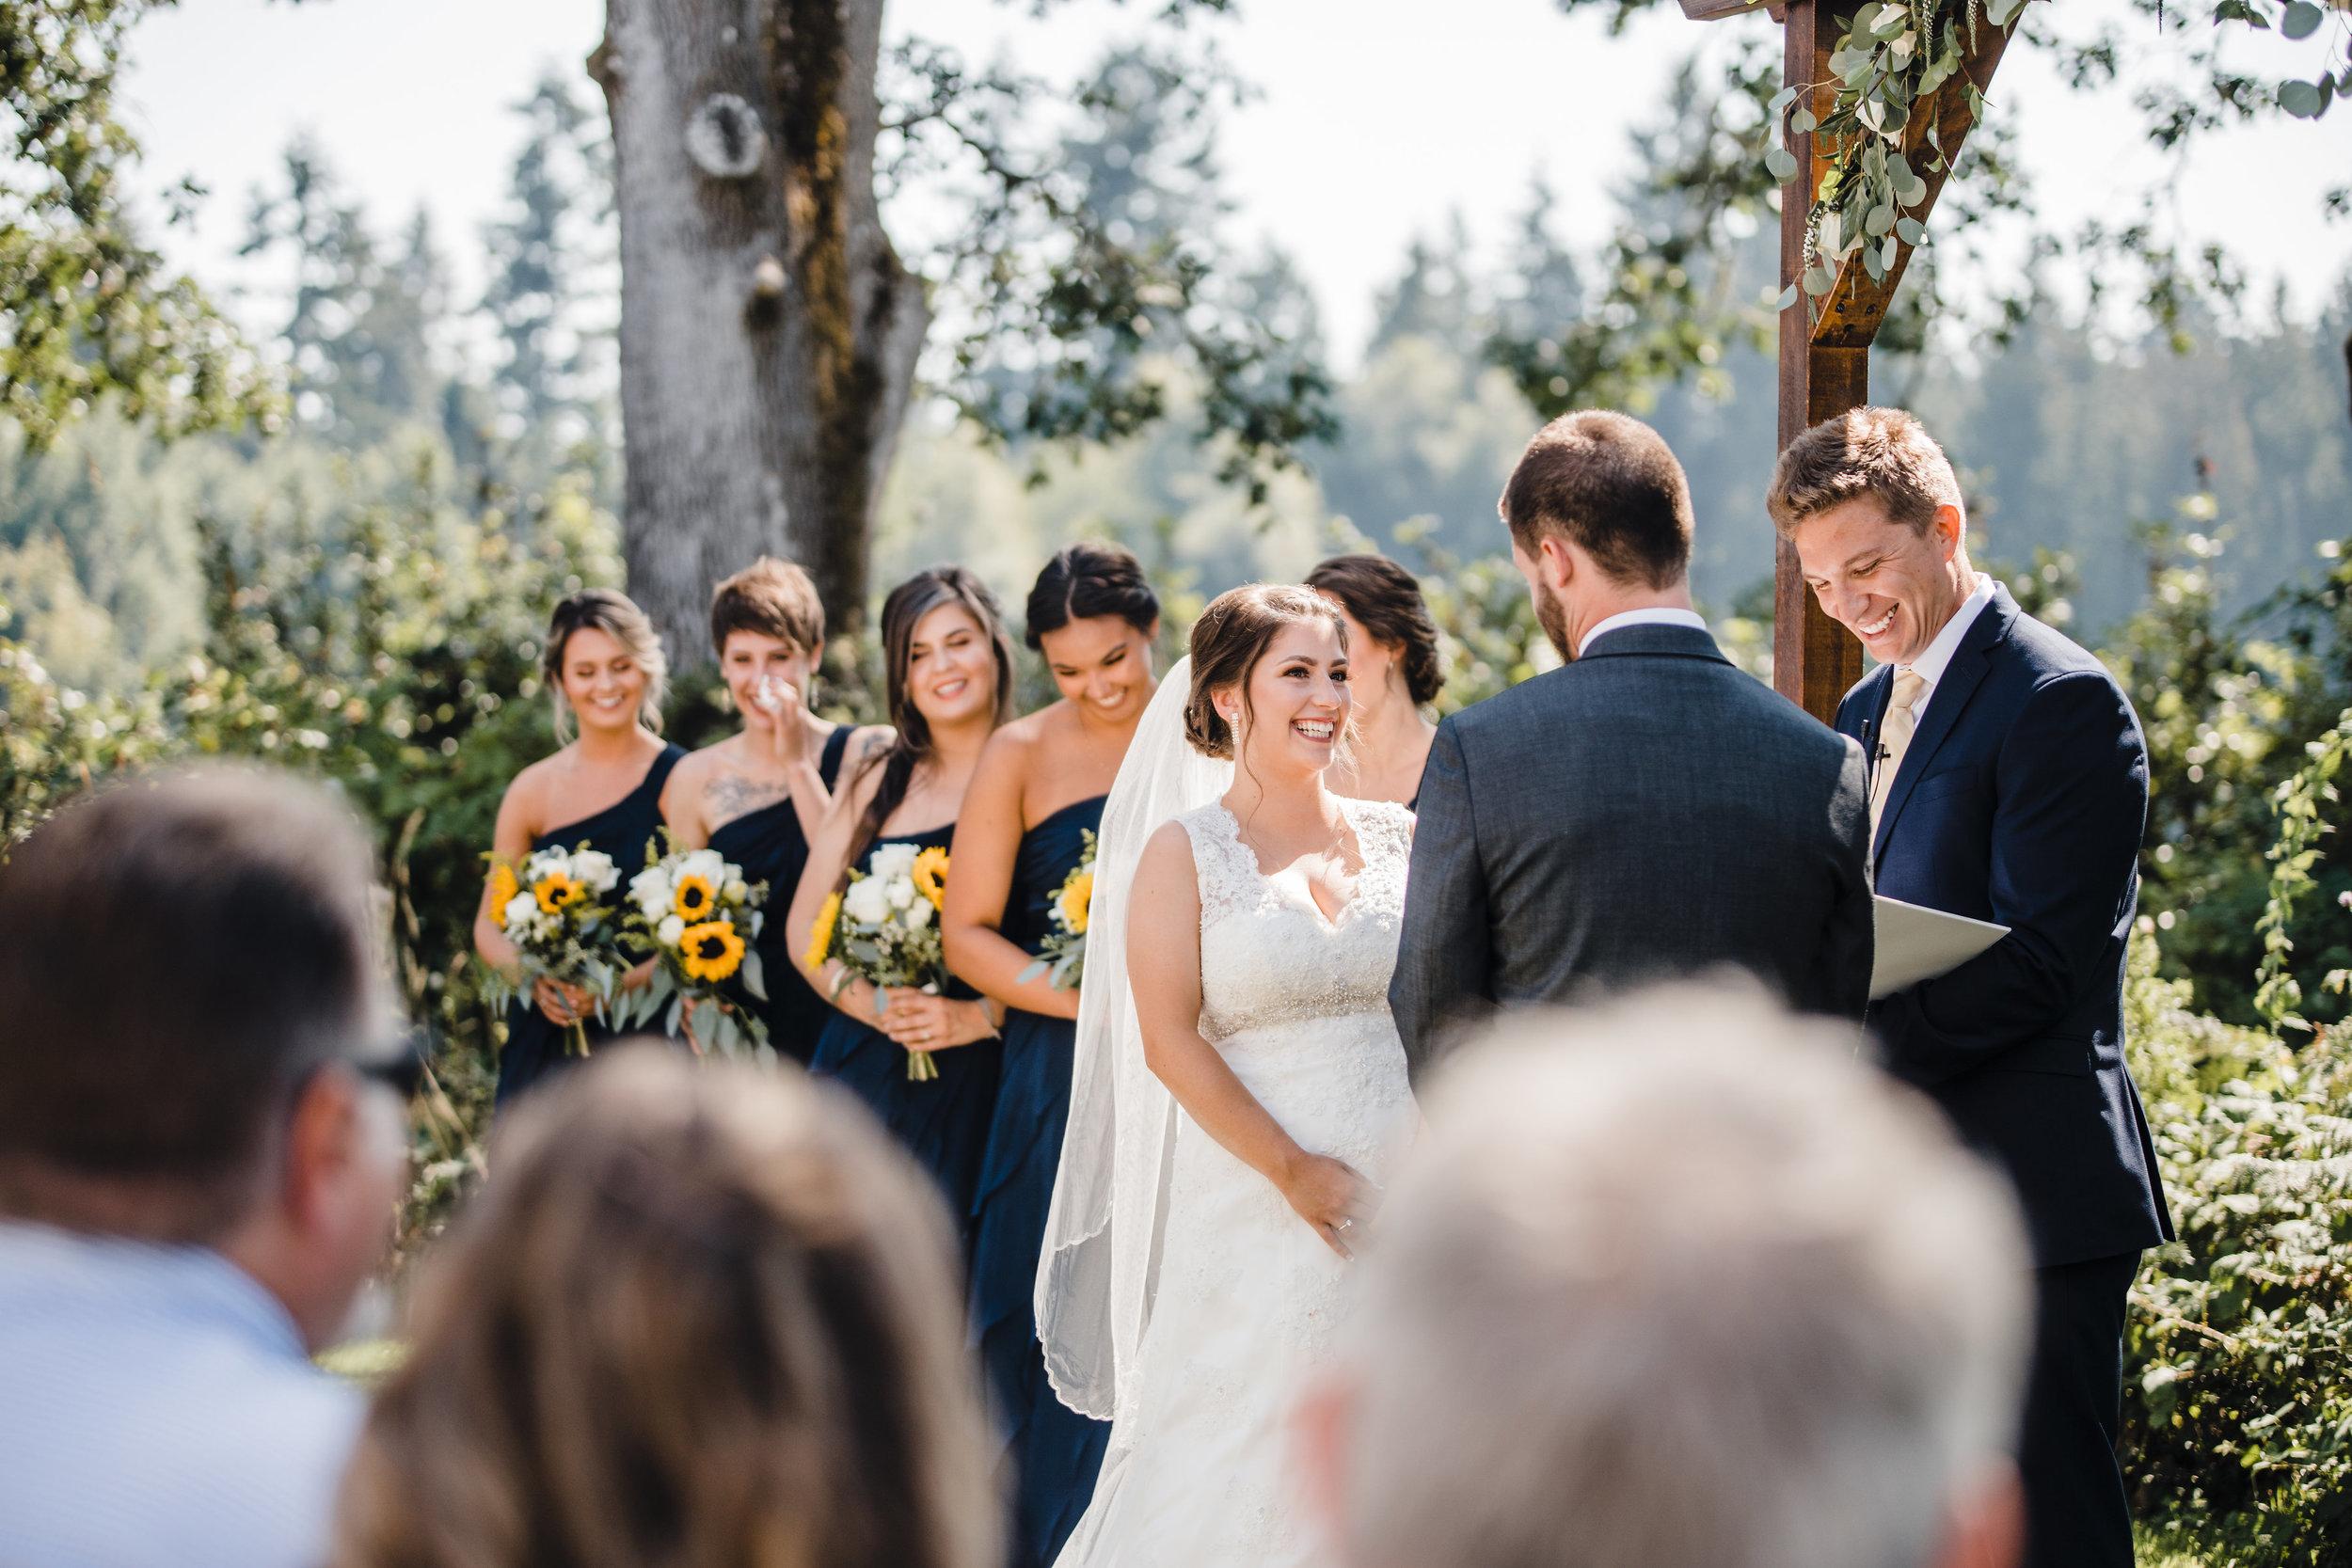 olympia washington professional wedding photographer wedding party wedding arch happy